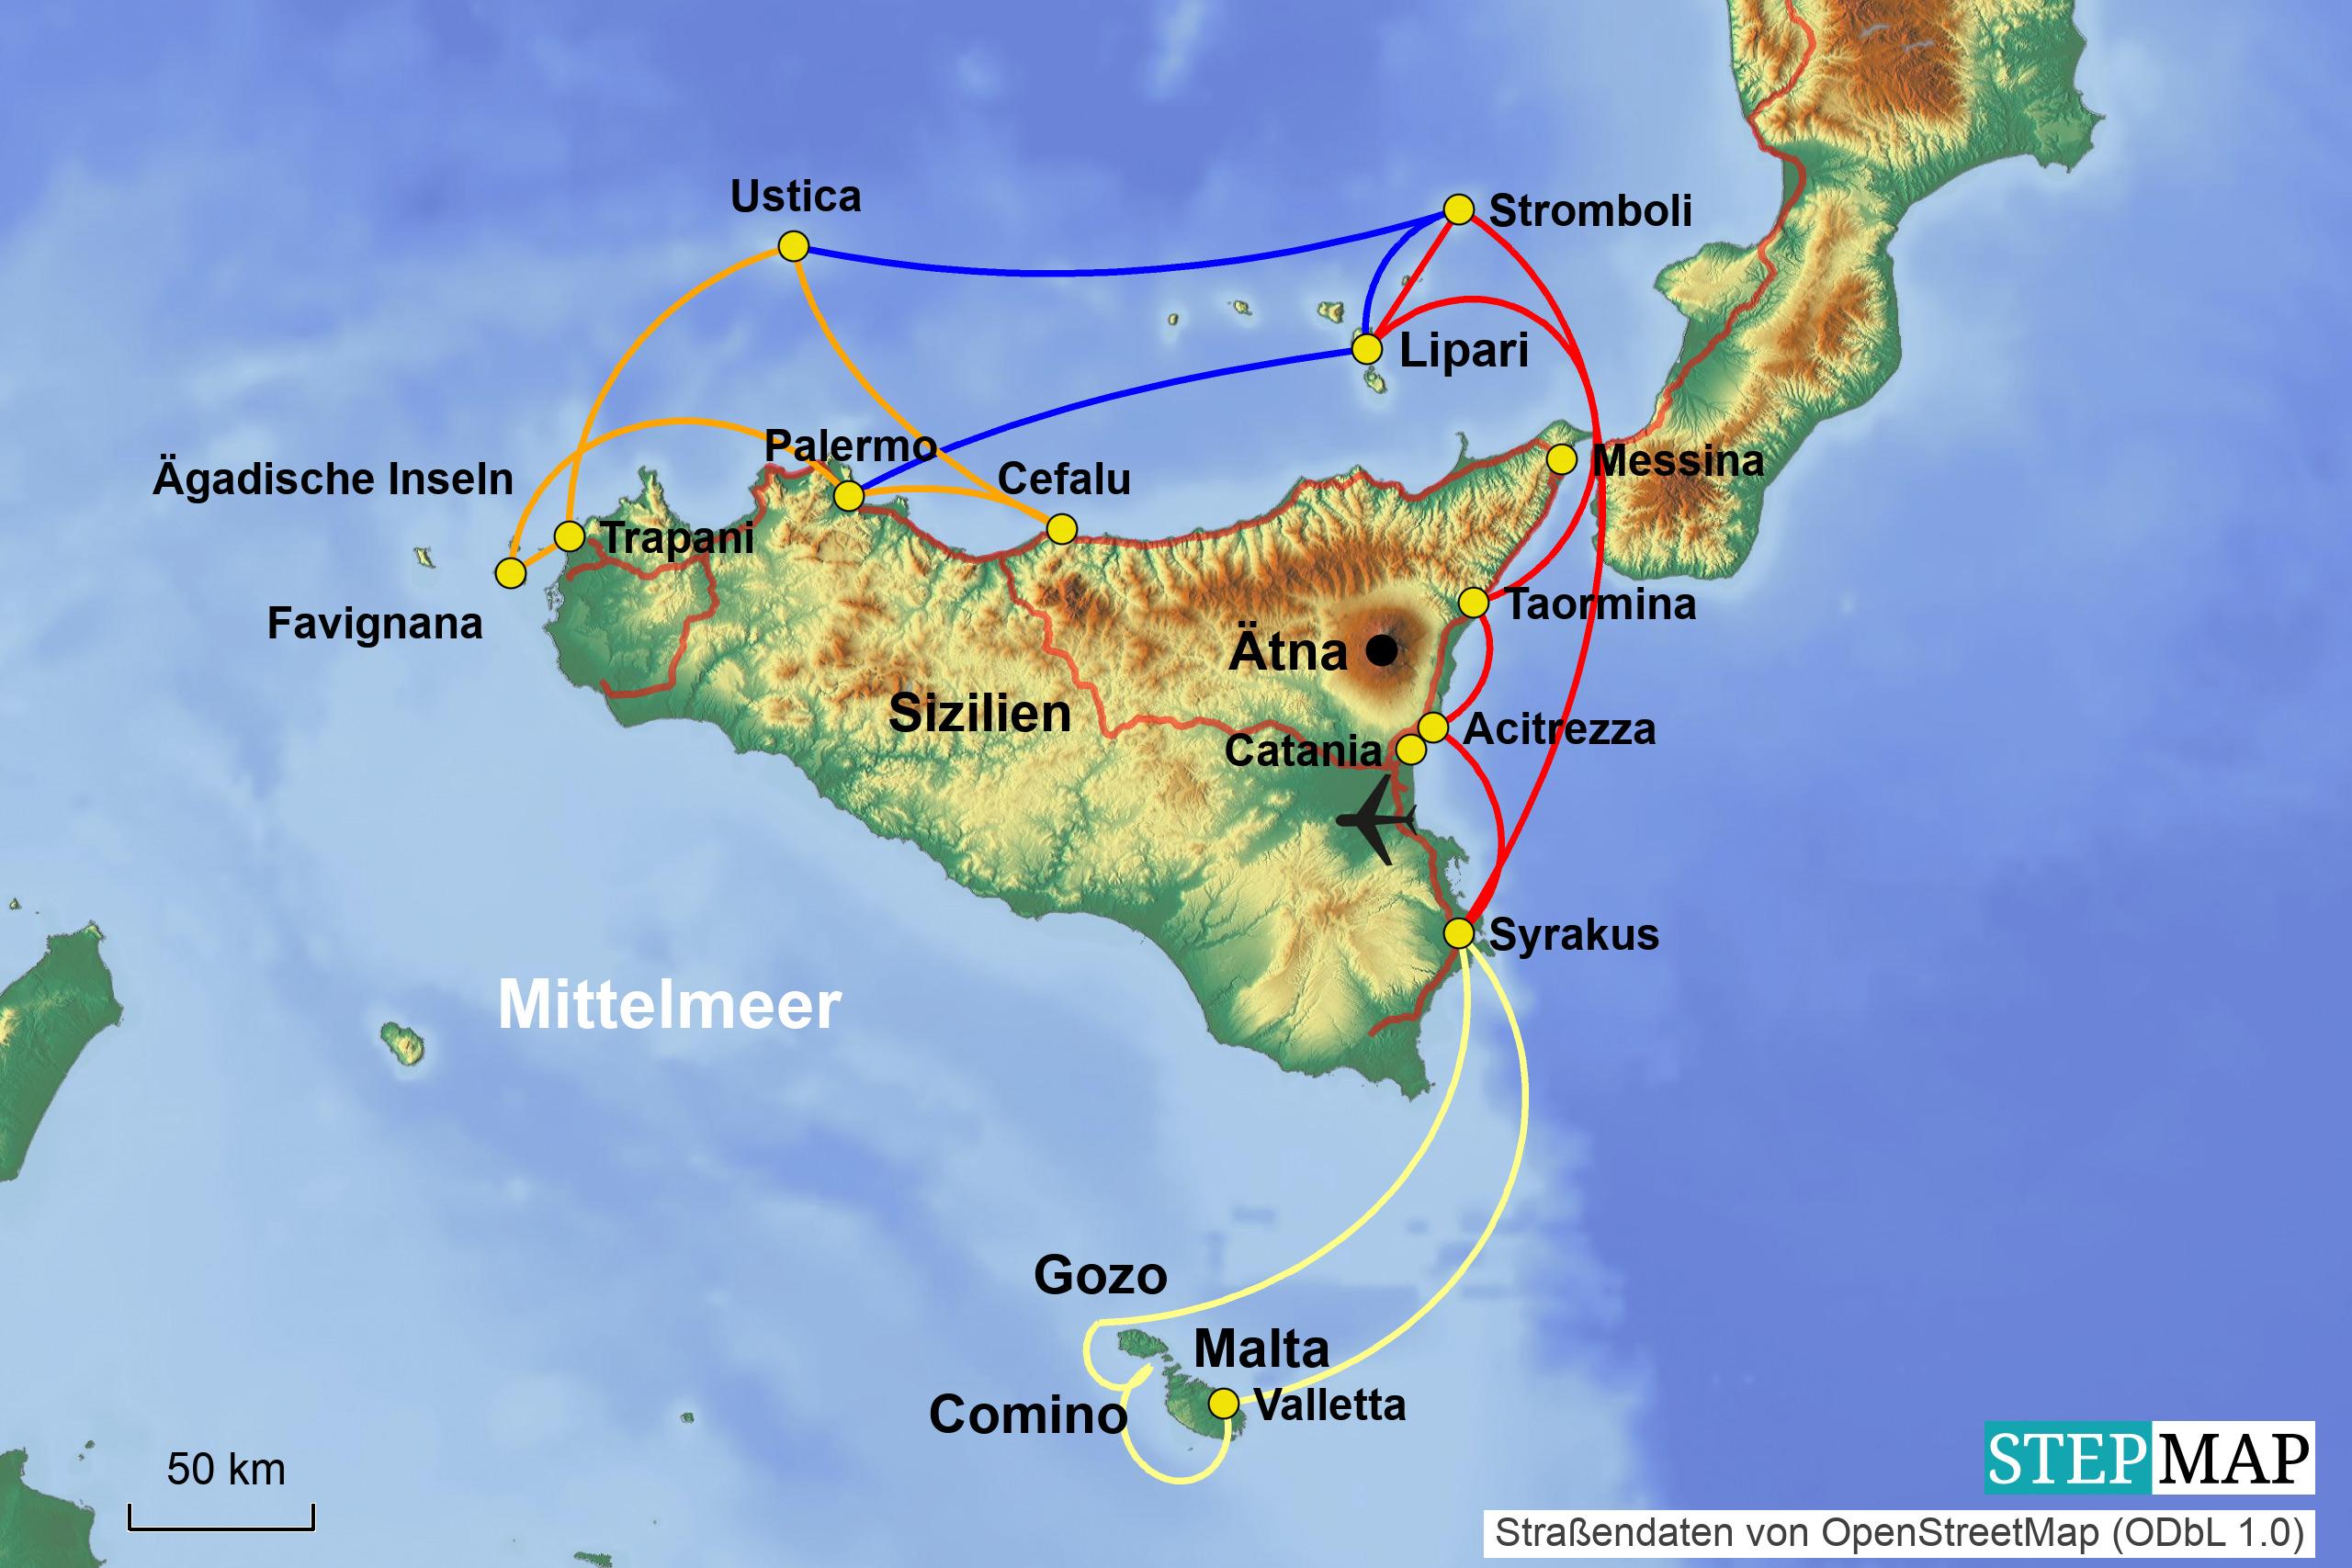 Sizilien Karte ätna.Kw 29 20 Sizilien ätna Taormina Straße Von Messina Lipari